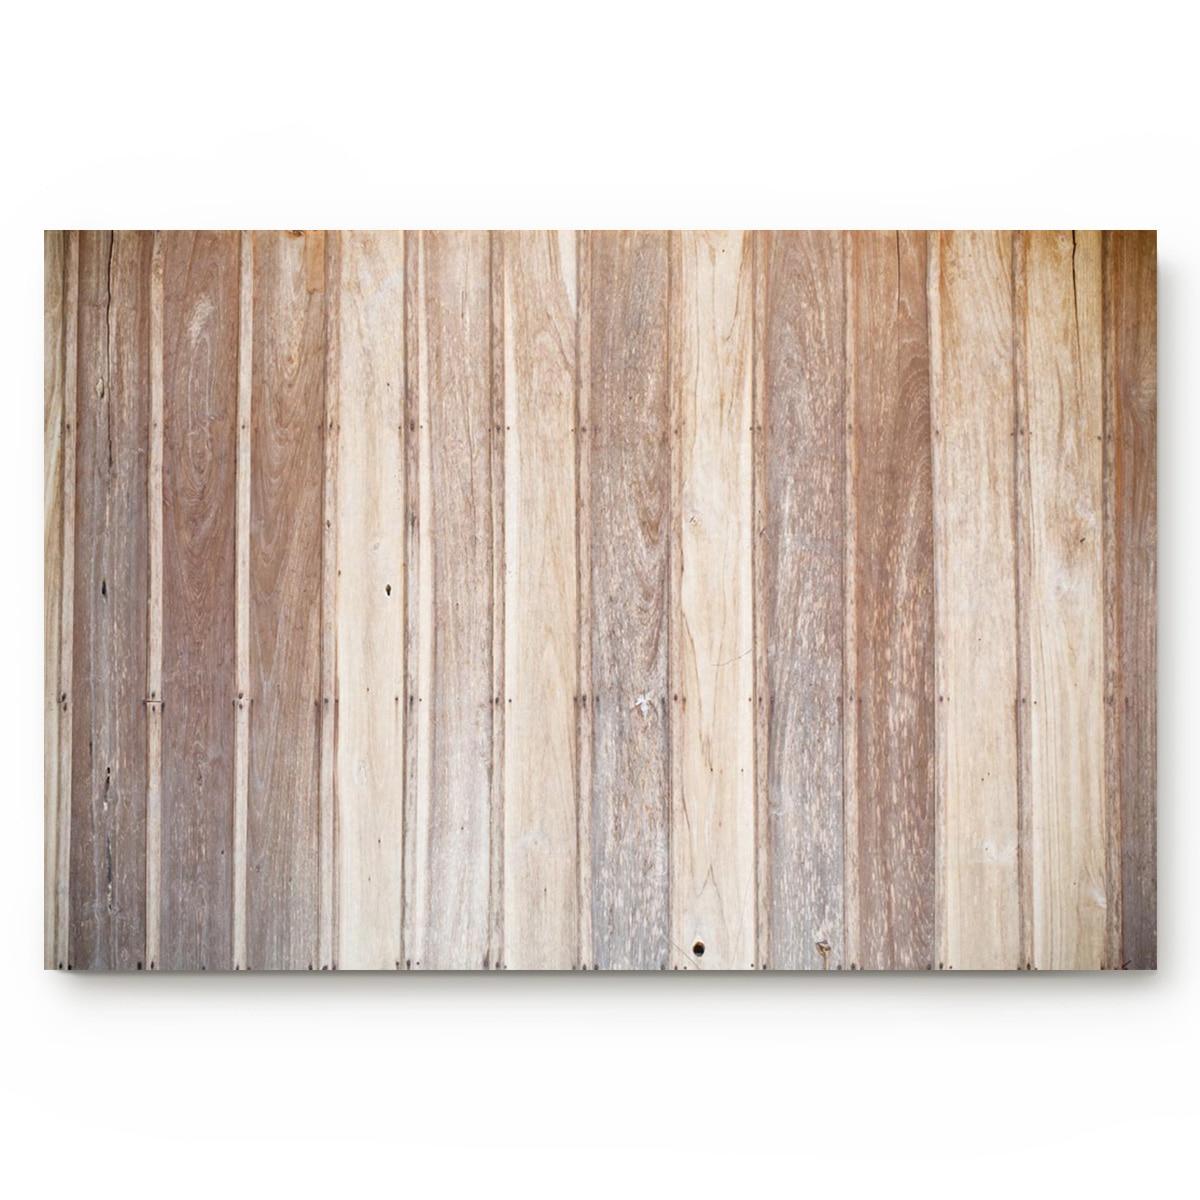 Tablón de madera Retro marrón alfombras de baño antideslizantes felpudo puerta Mat accesorios de baño